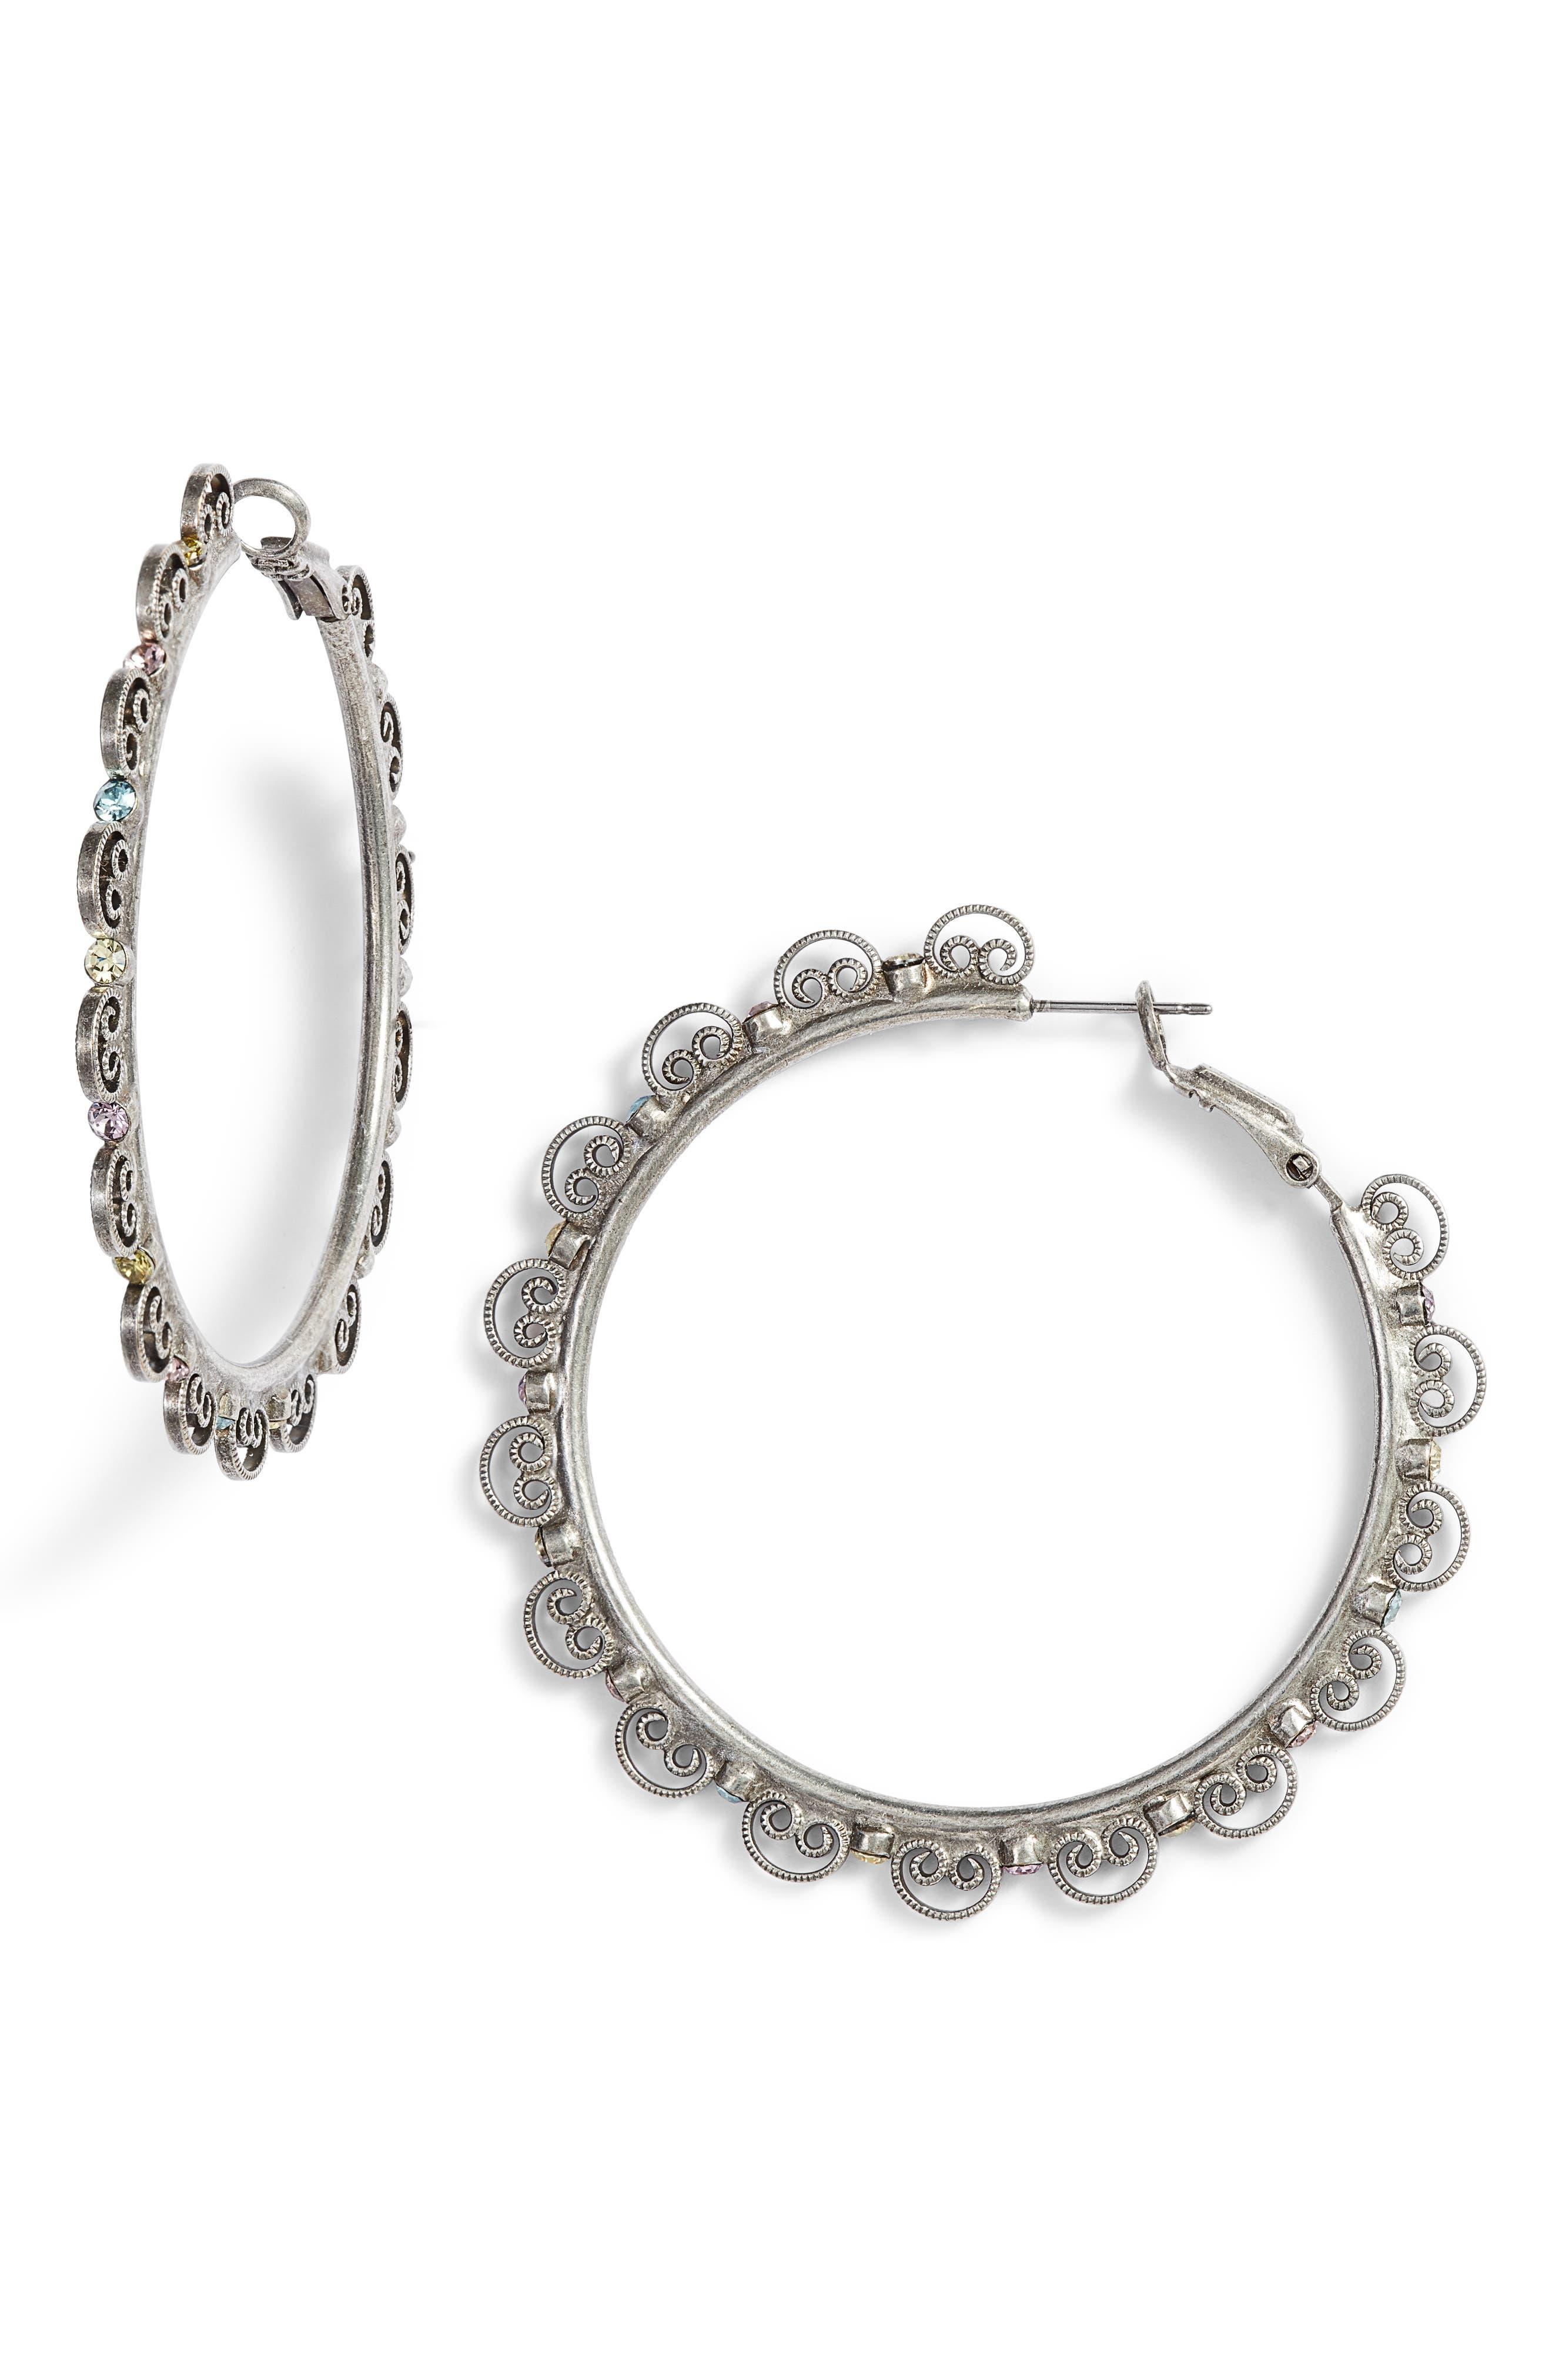 Foxglove Crystal Hoop Earrings,                             Main thumbnail 1, color,                             040